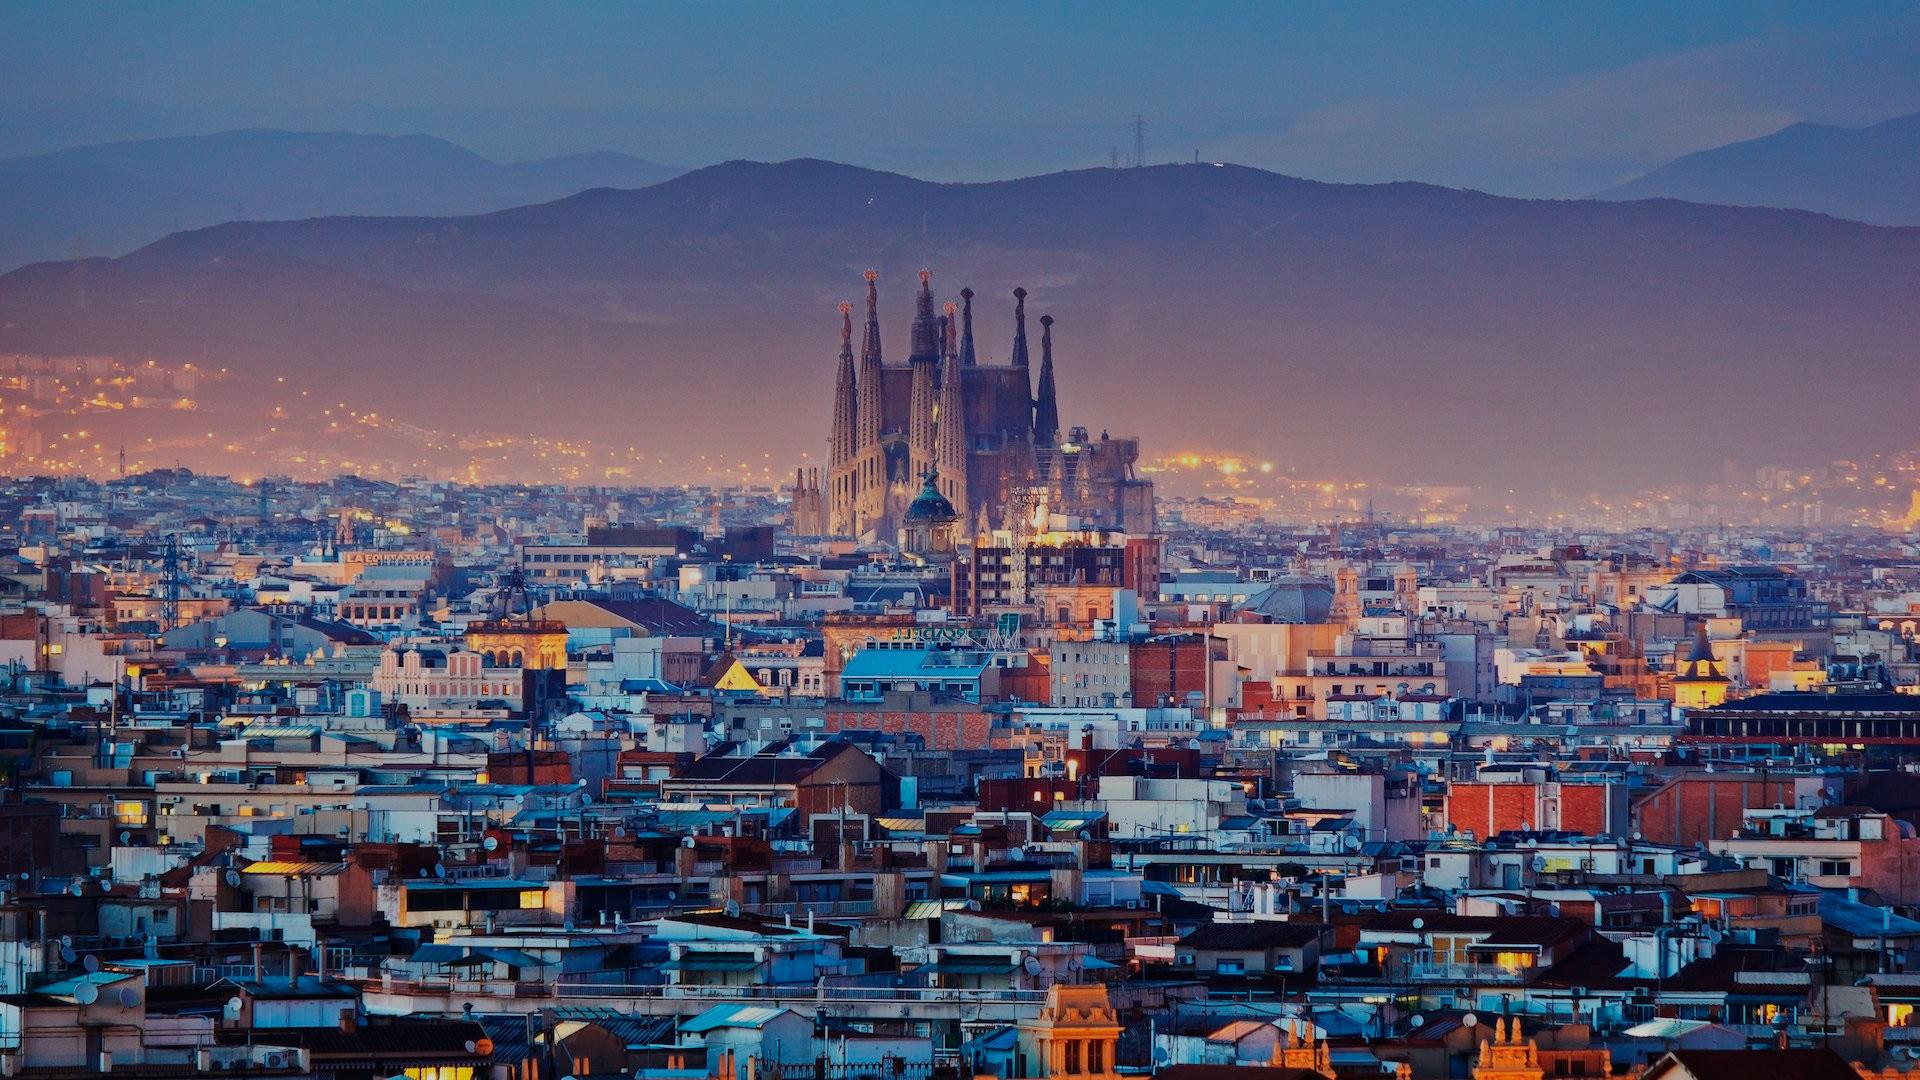 visitas-guiadas-a-barcelona--desde-reus